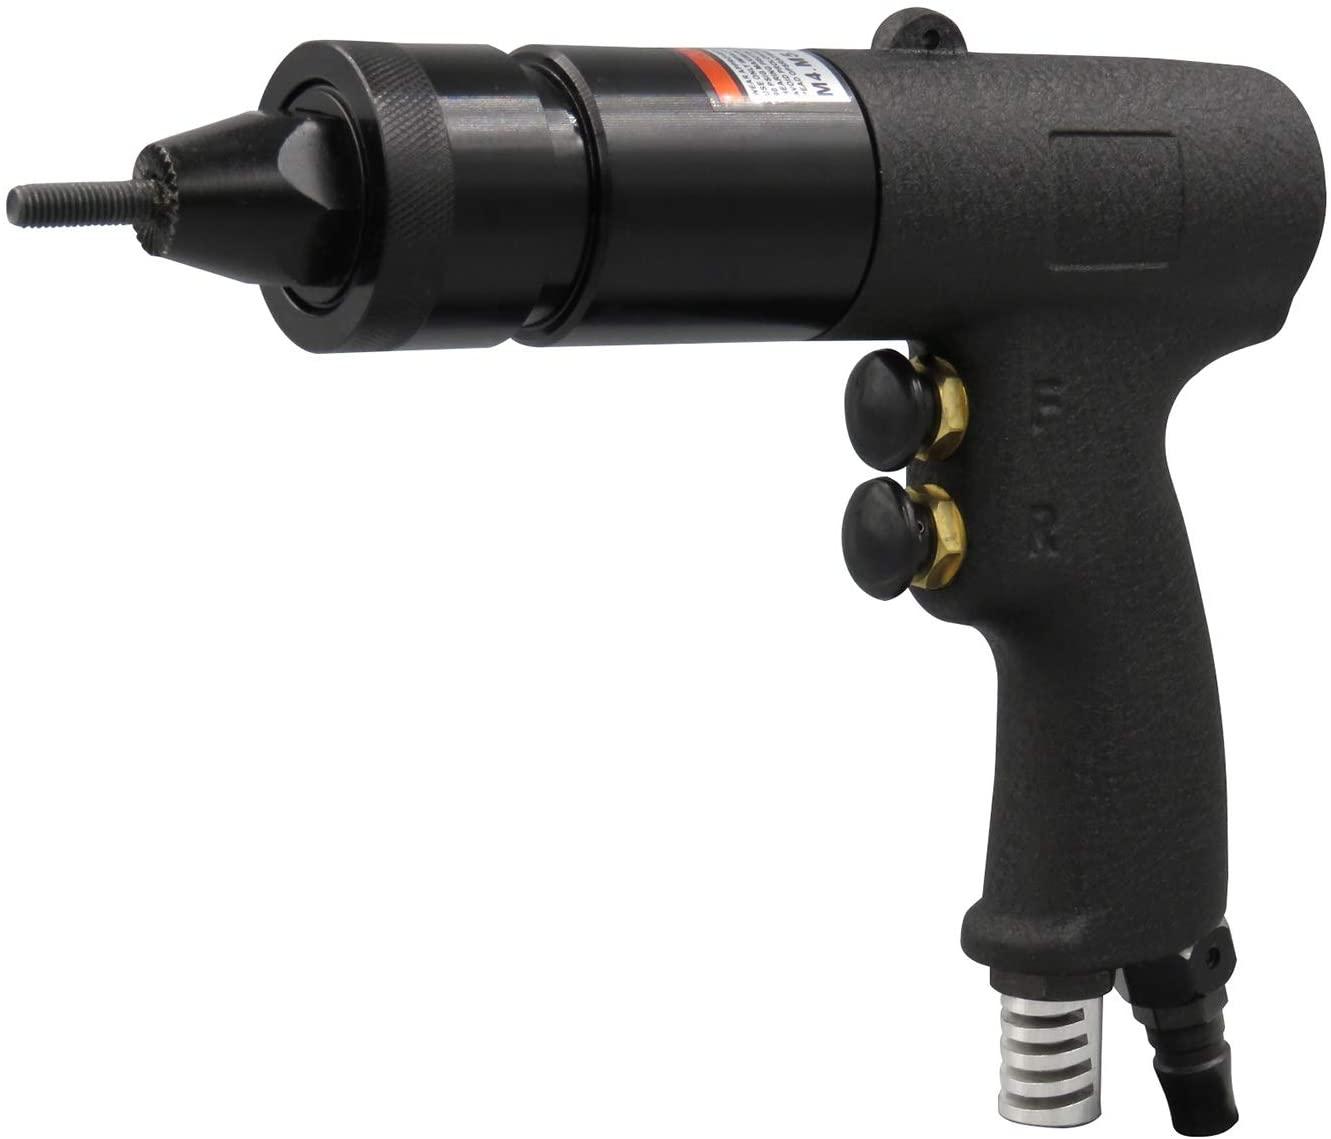 M5-M6 Pneumatic Rivet Gun,Industrial Grade Rivet Nut Gun,Pneumatic Rivet Gun,Hand Tool TO